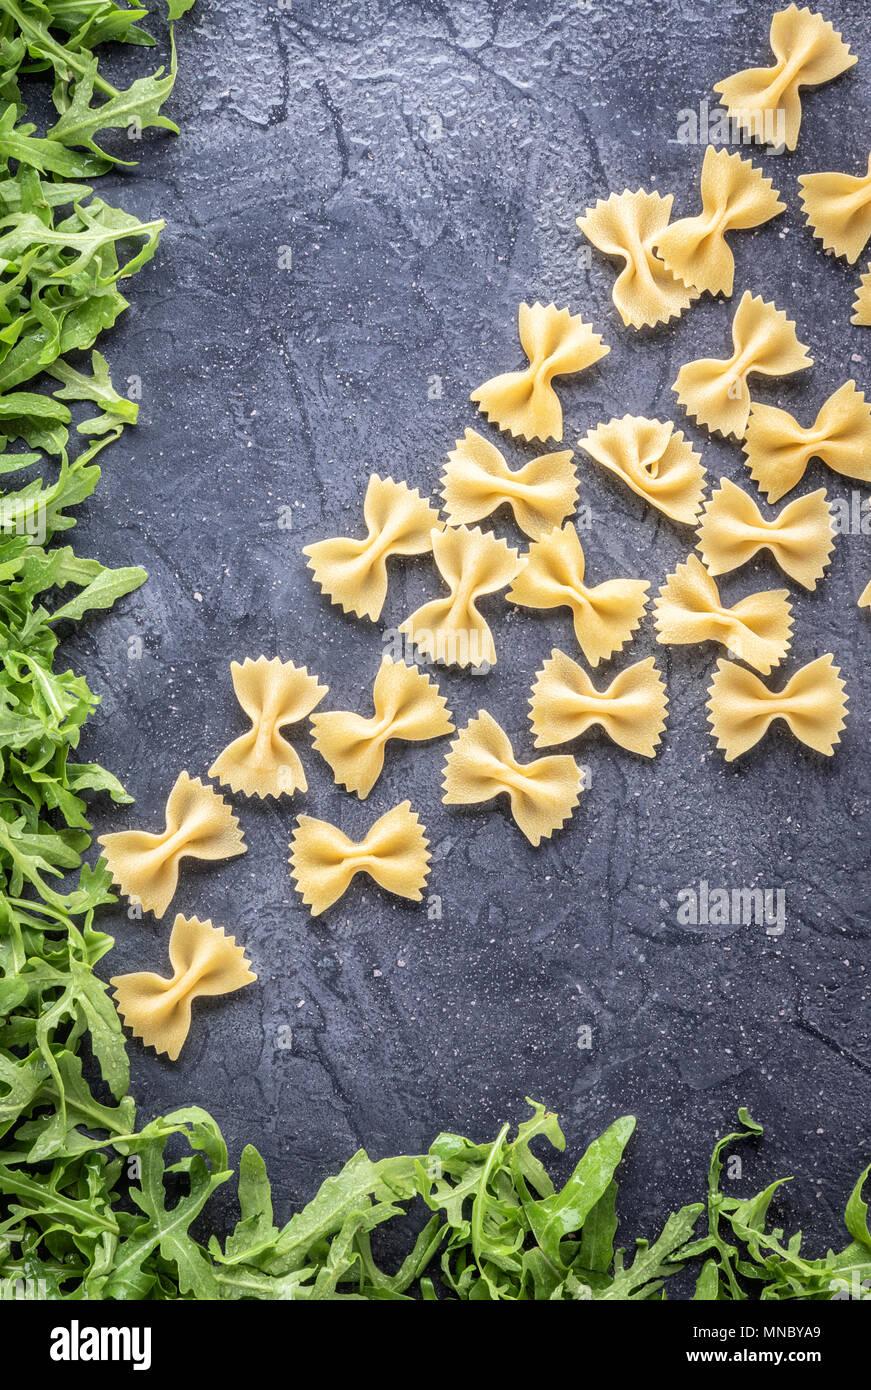 Food background Uncooked Pasta Macaroni Farfalle - Stock Image